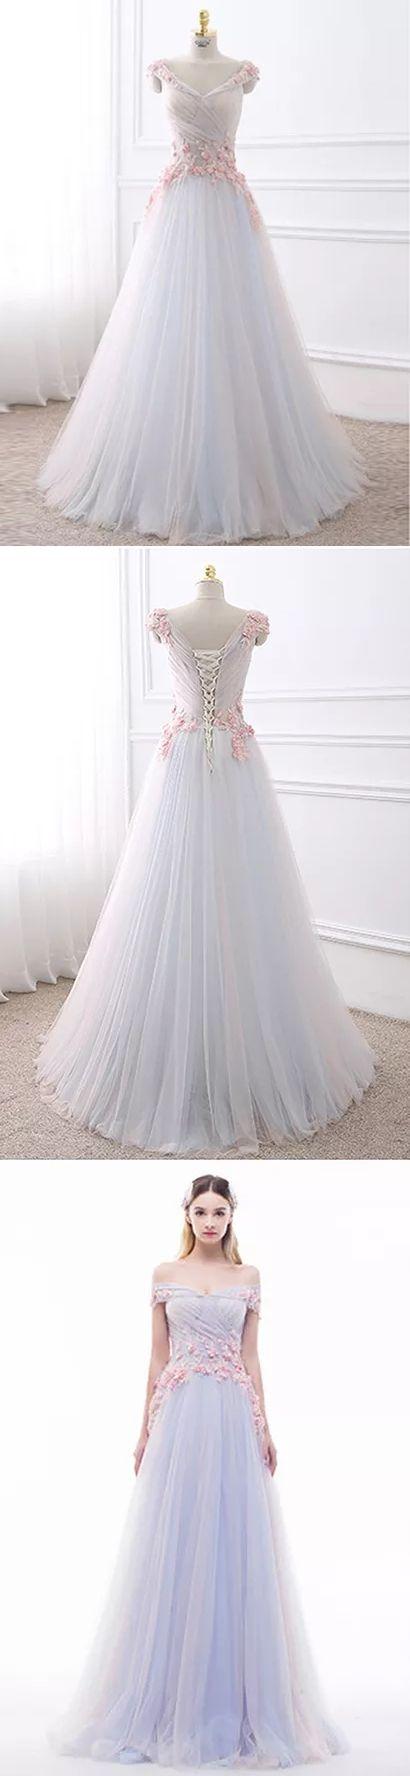 Would make a gorgeous standard dress if modified properly